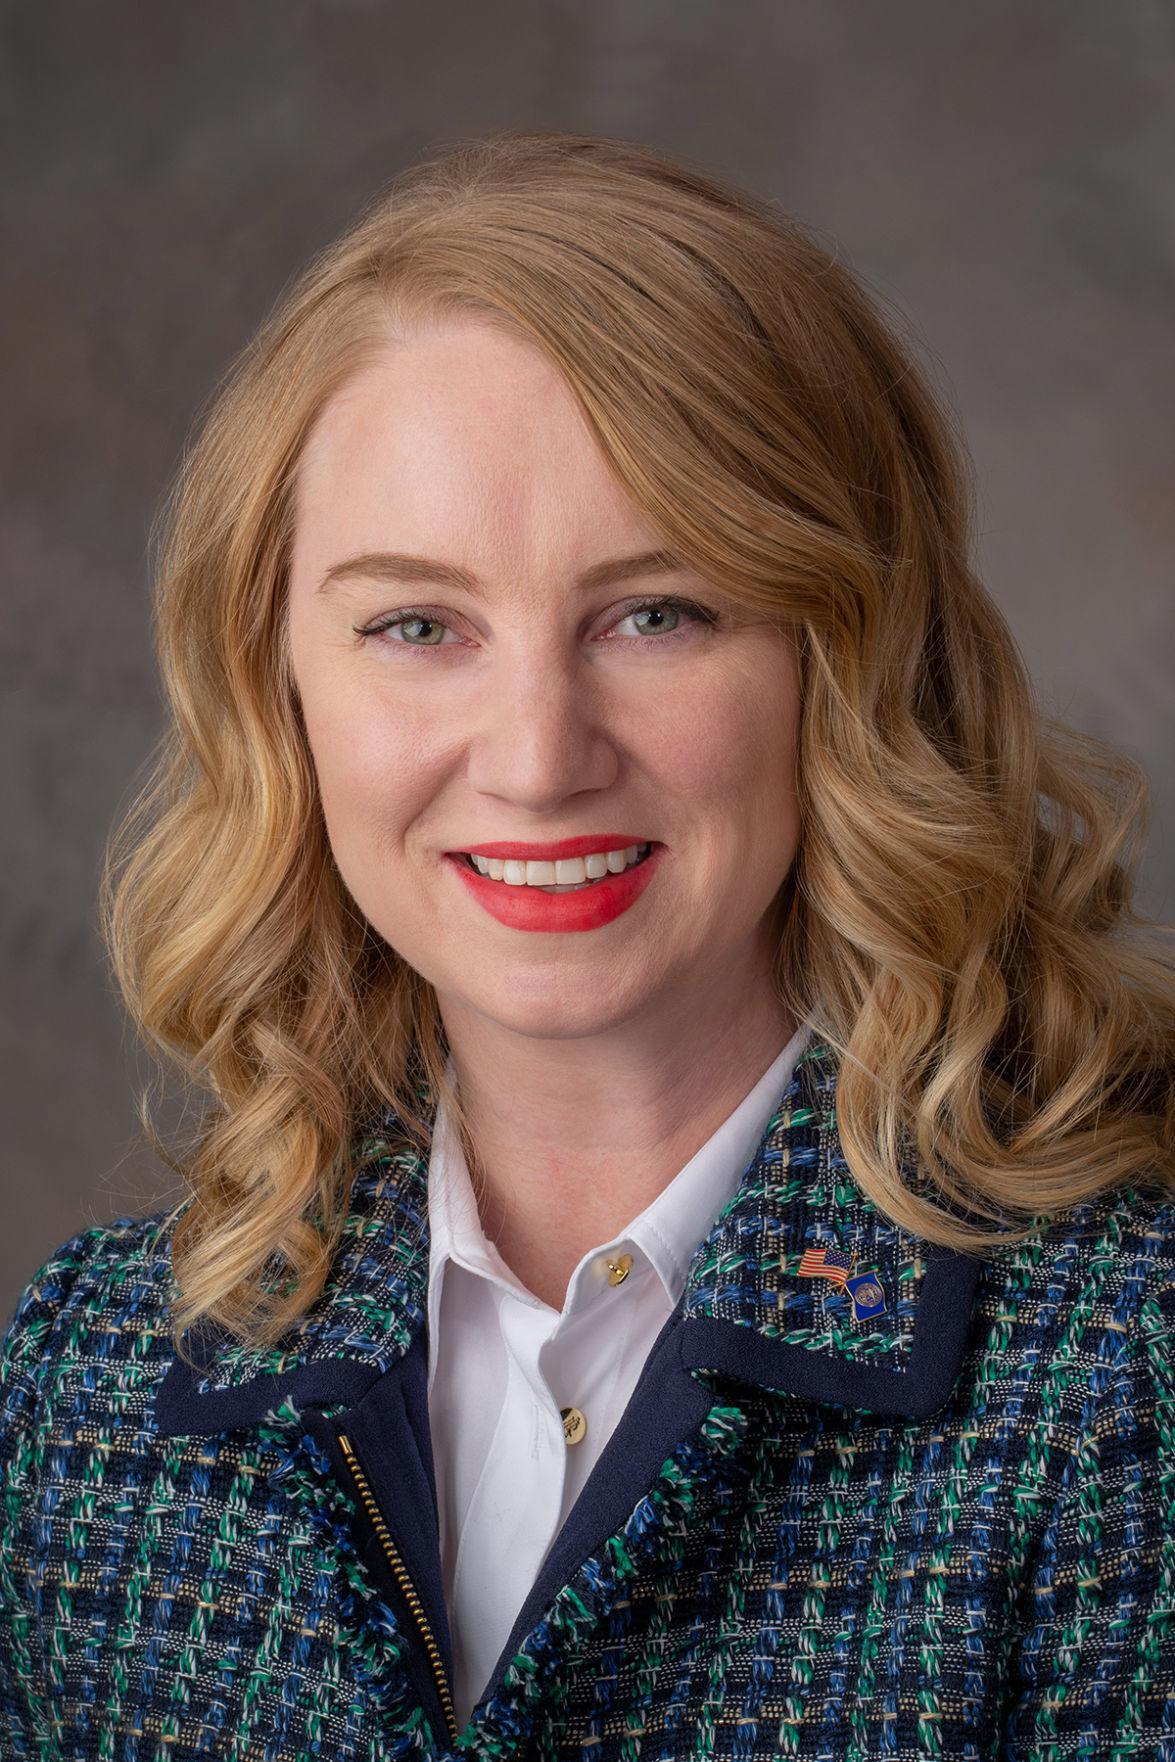 State Sen. Megan Hunt